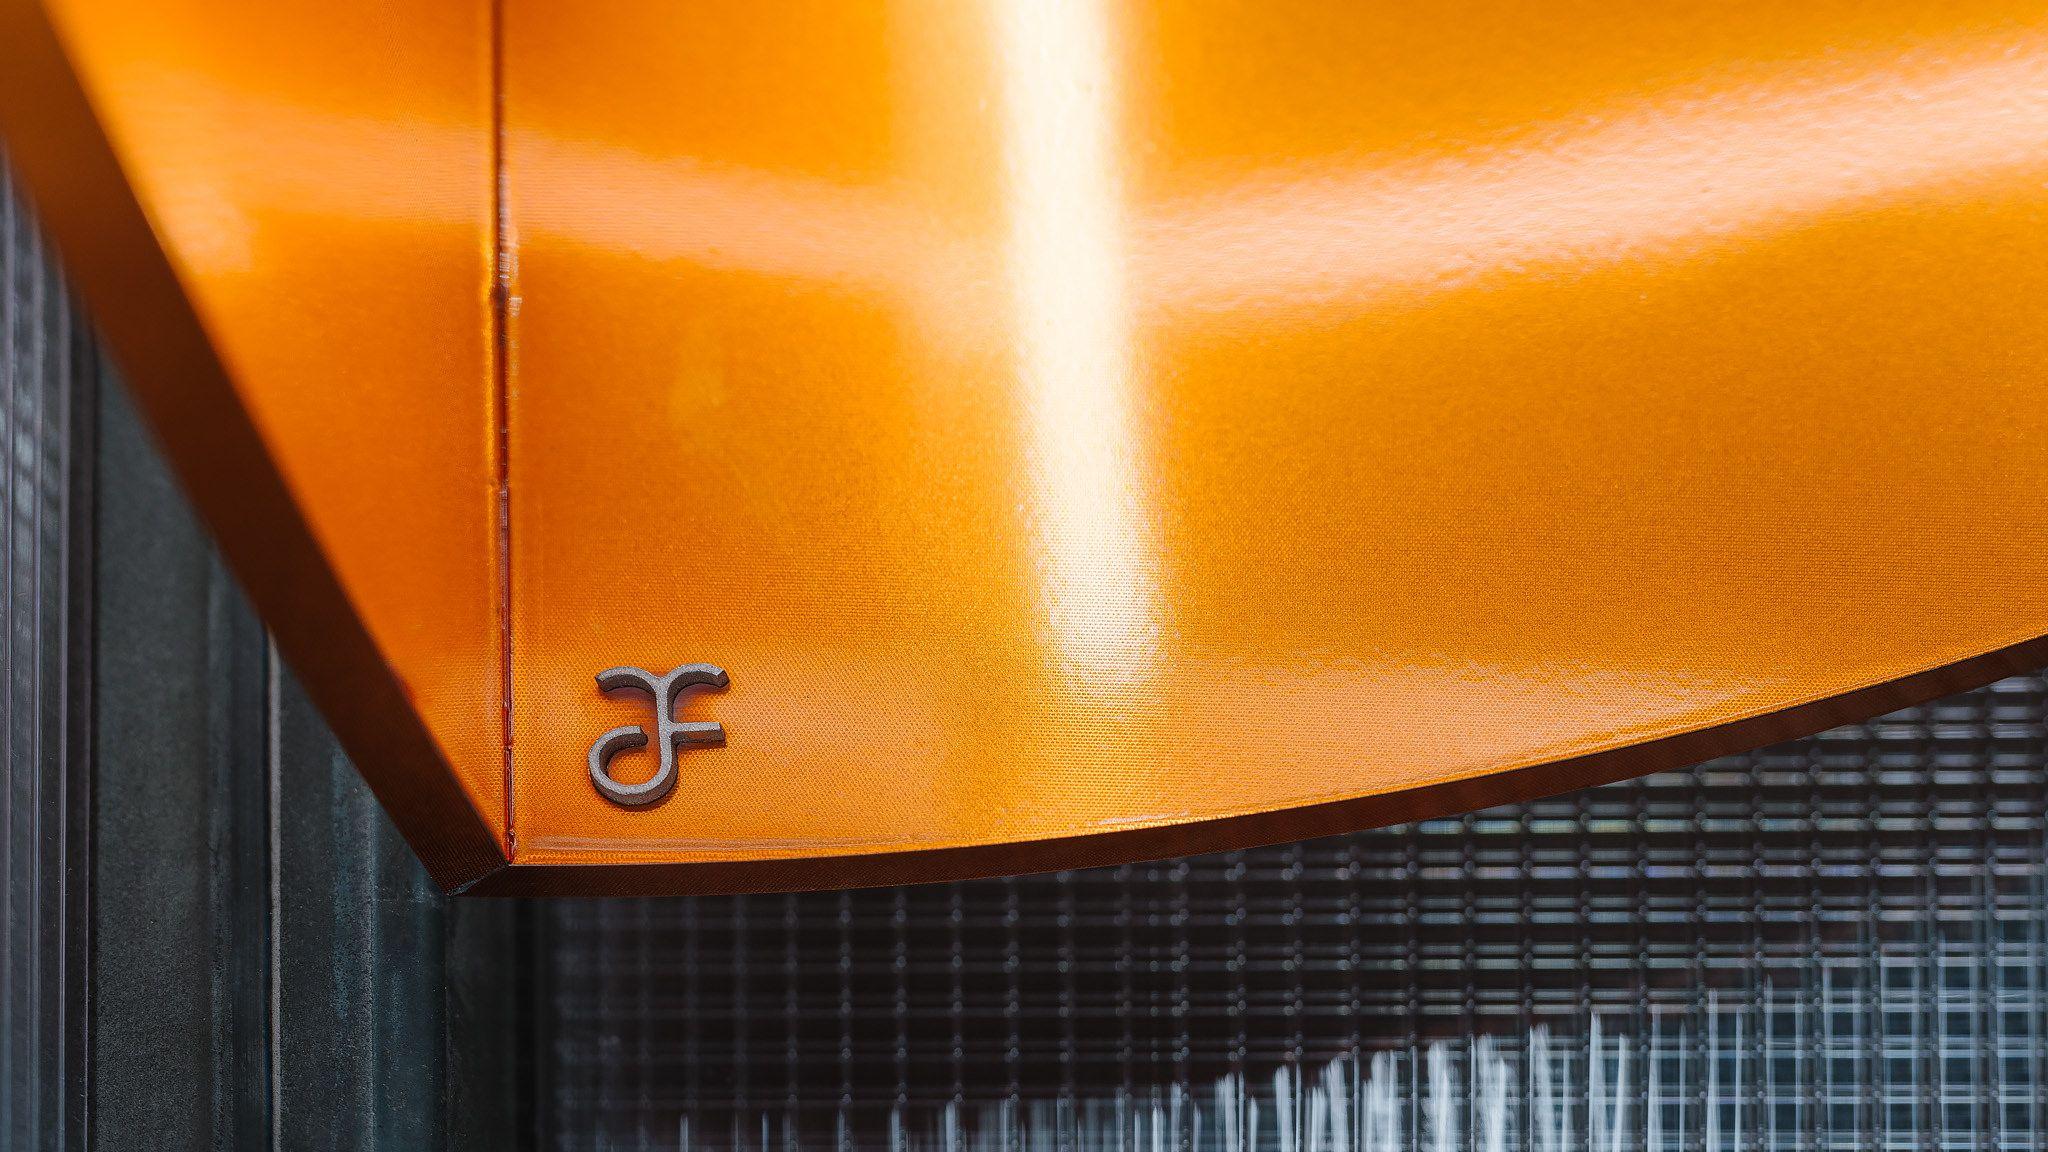 #Lunar #mirror design #AntonioAricò for #altreforme@Salone del Mobile.Milano  #MetallicDiscoGalaxy #Galactica #altreformestarringChupaChups new collections 2017 #designweek #interior #home #decor #homedecor #furniture with #woweffect #aluminium #art #architecture #design #decoration #interiordesign #fashion #style #home #hotel #milan #italy #madeinItaly #bespoke #luxury #furnishing